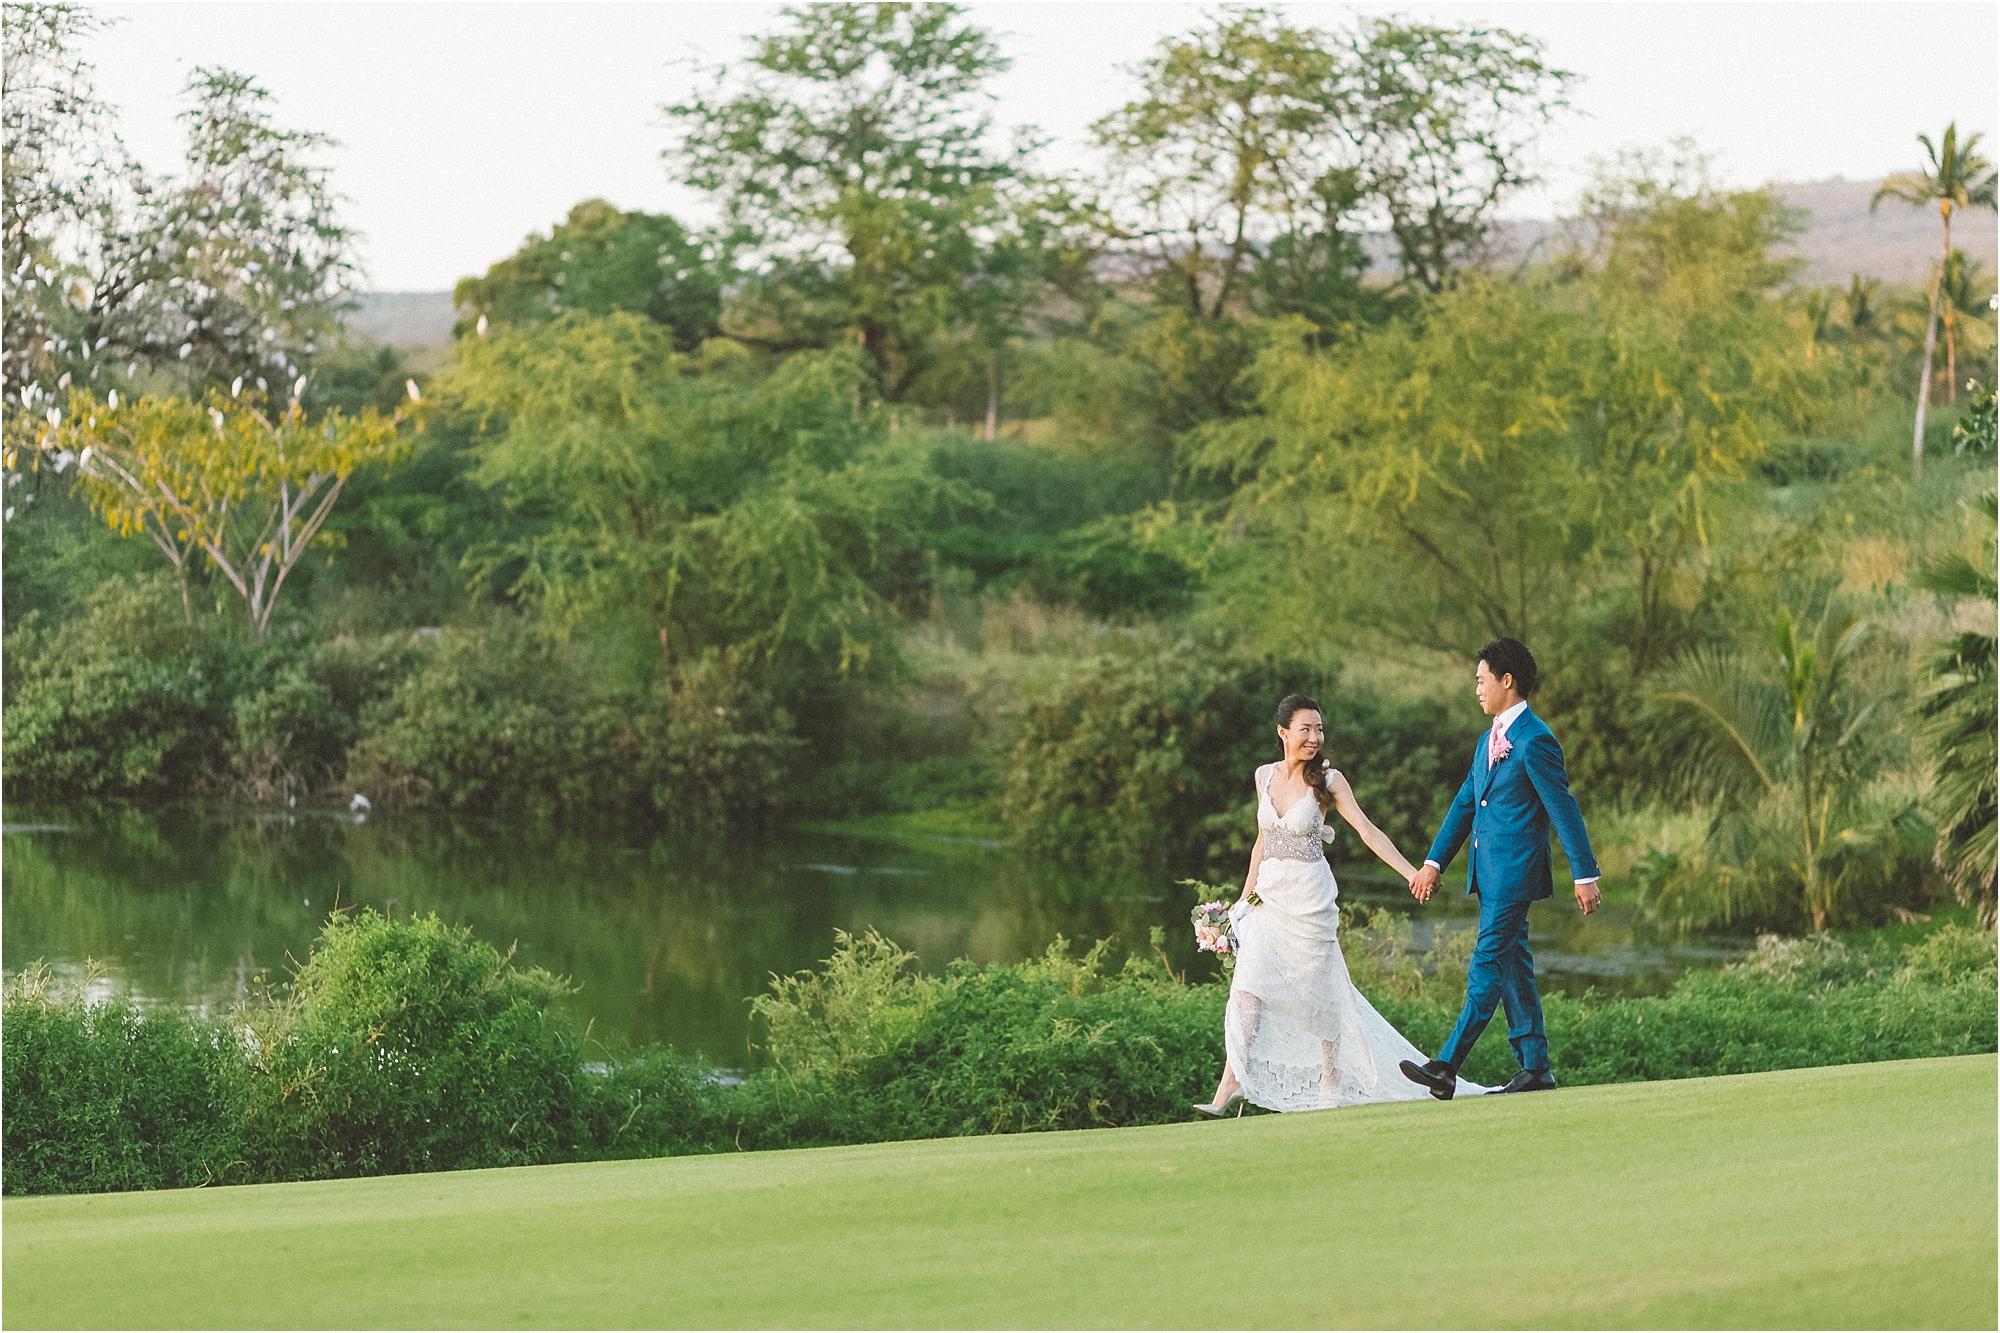 angie-diaz-photography-maui-hawaii-destination-wedding-makena-golf-beach-club_0064.jpg